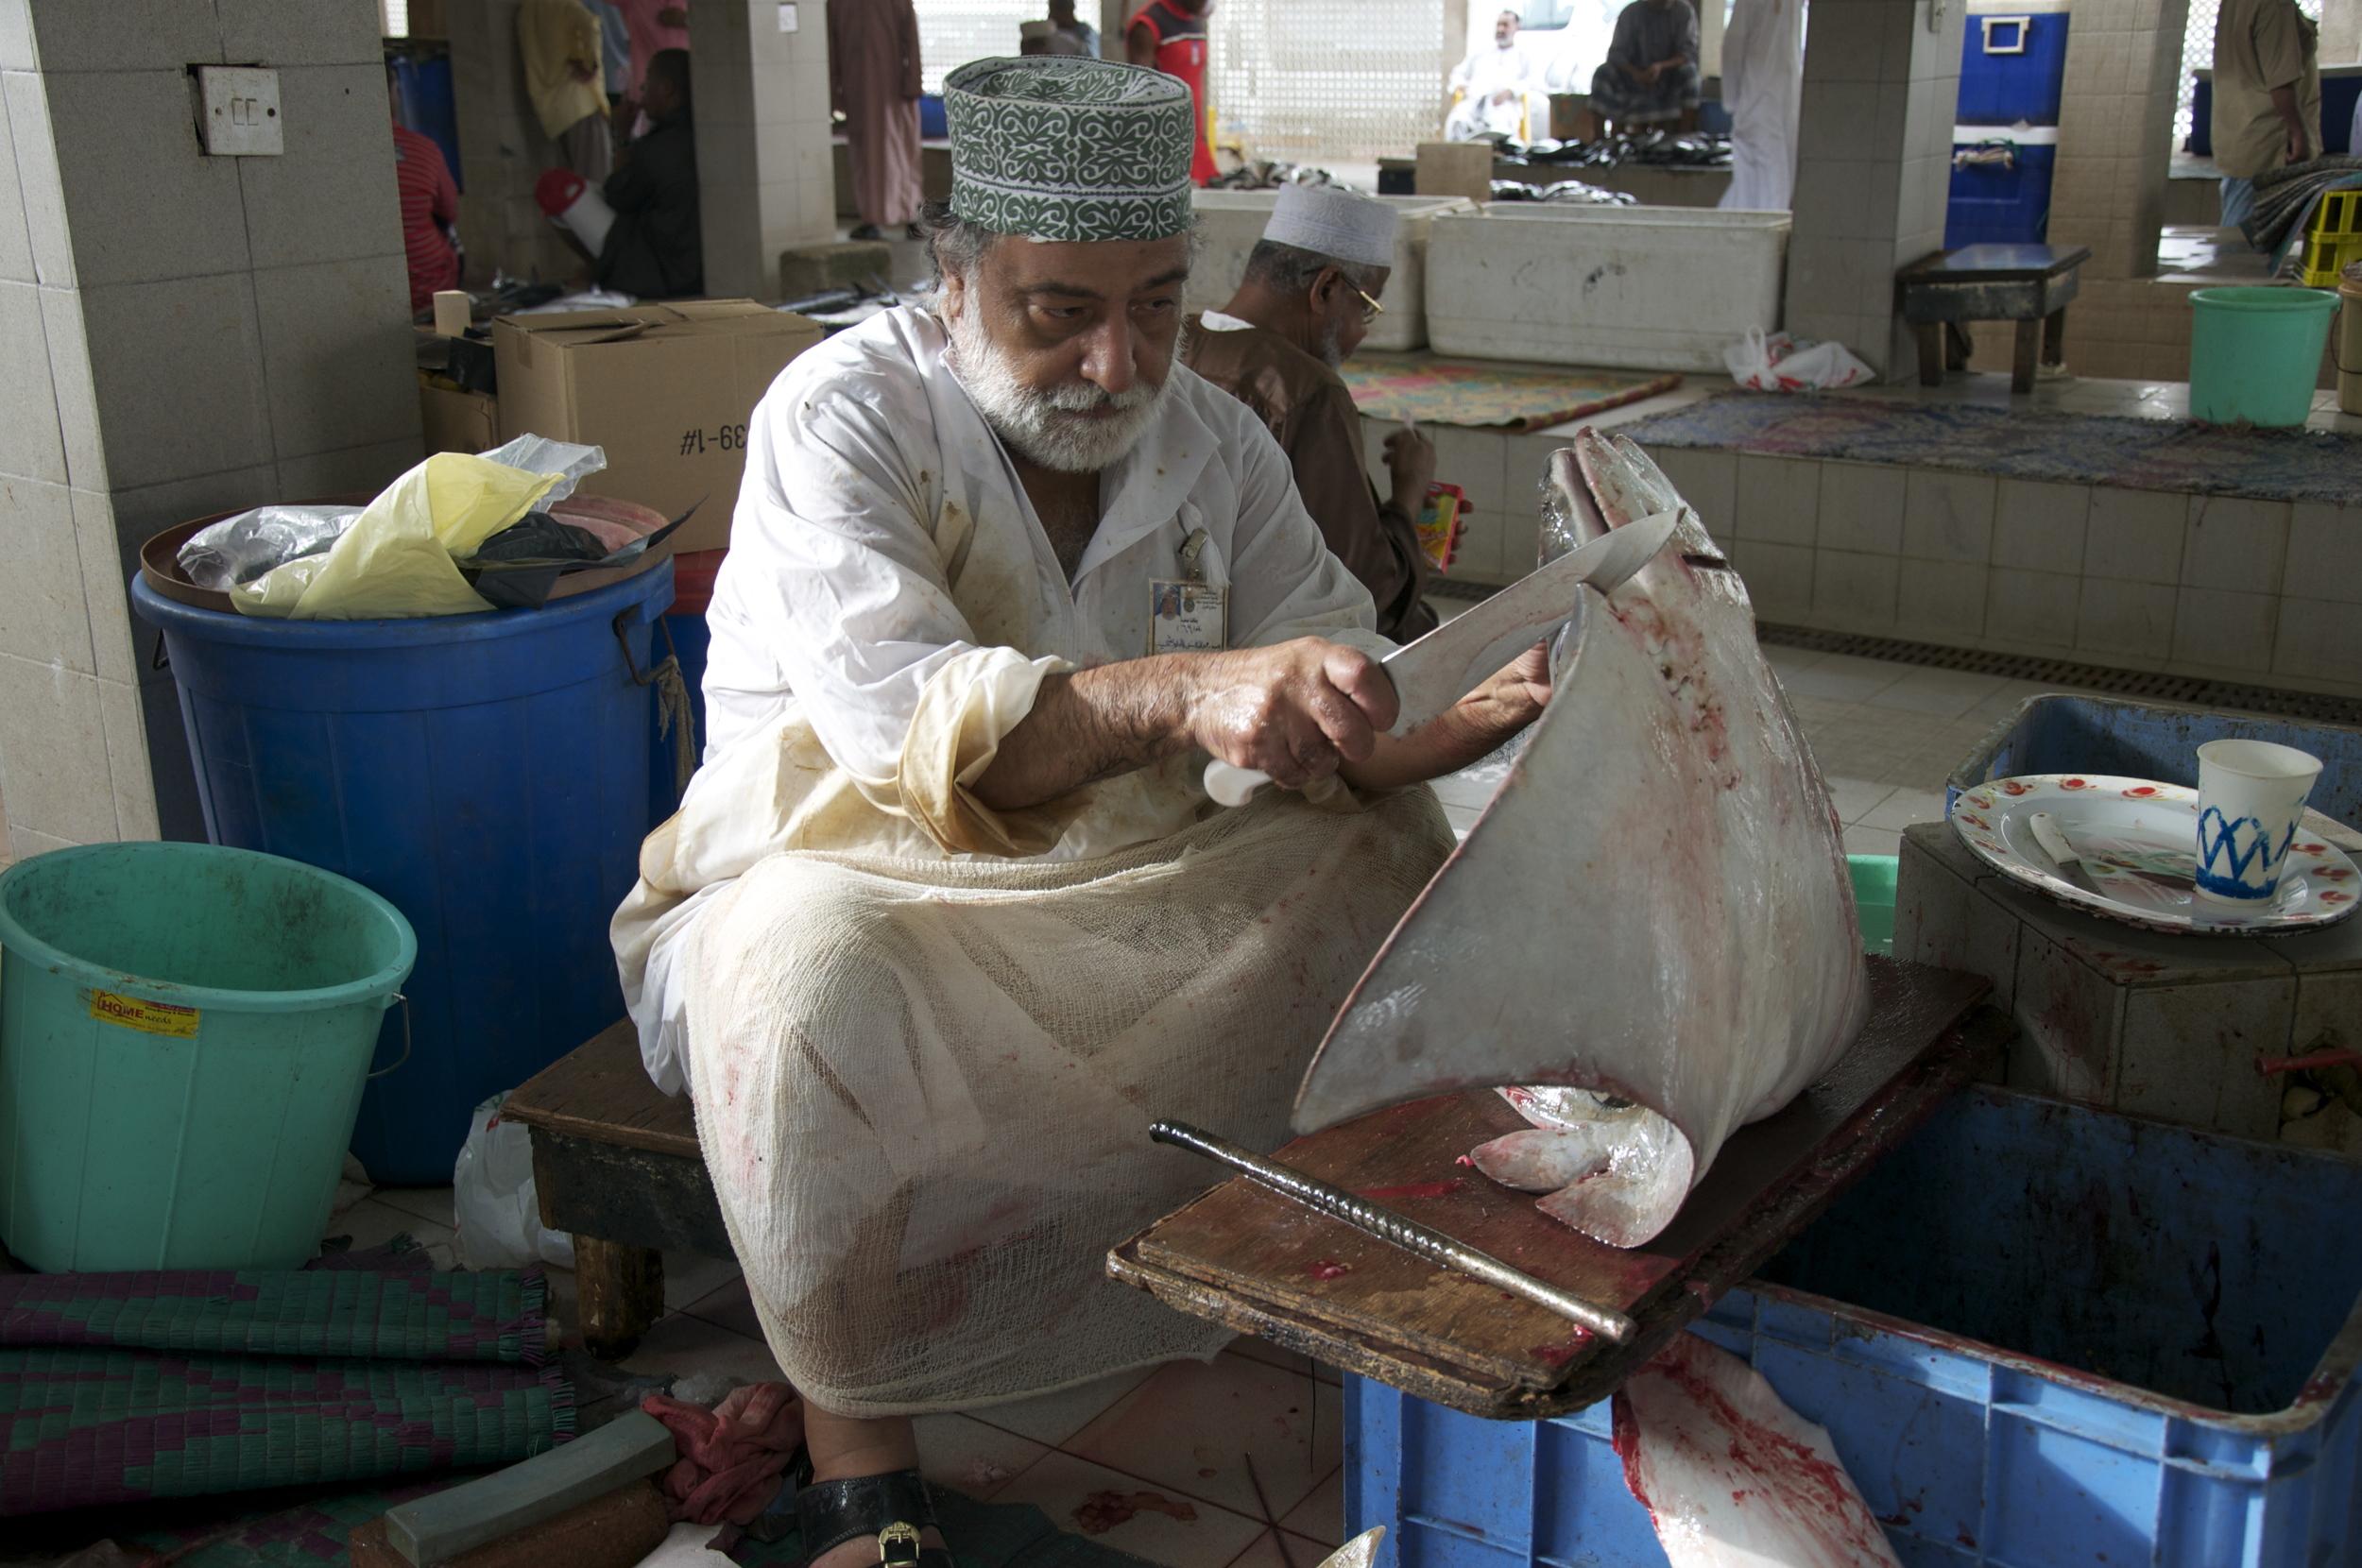 An Omani fisherman cuts skate wings. Photo copyright Meghan Miner Murray.